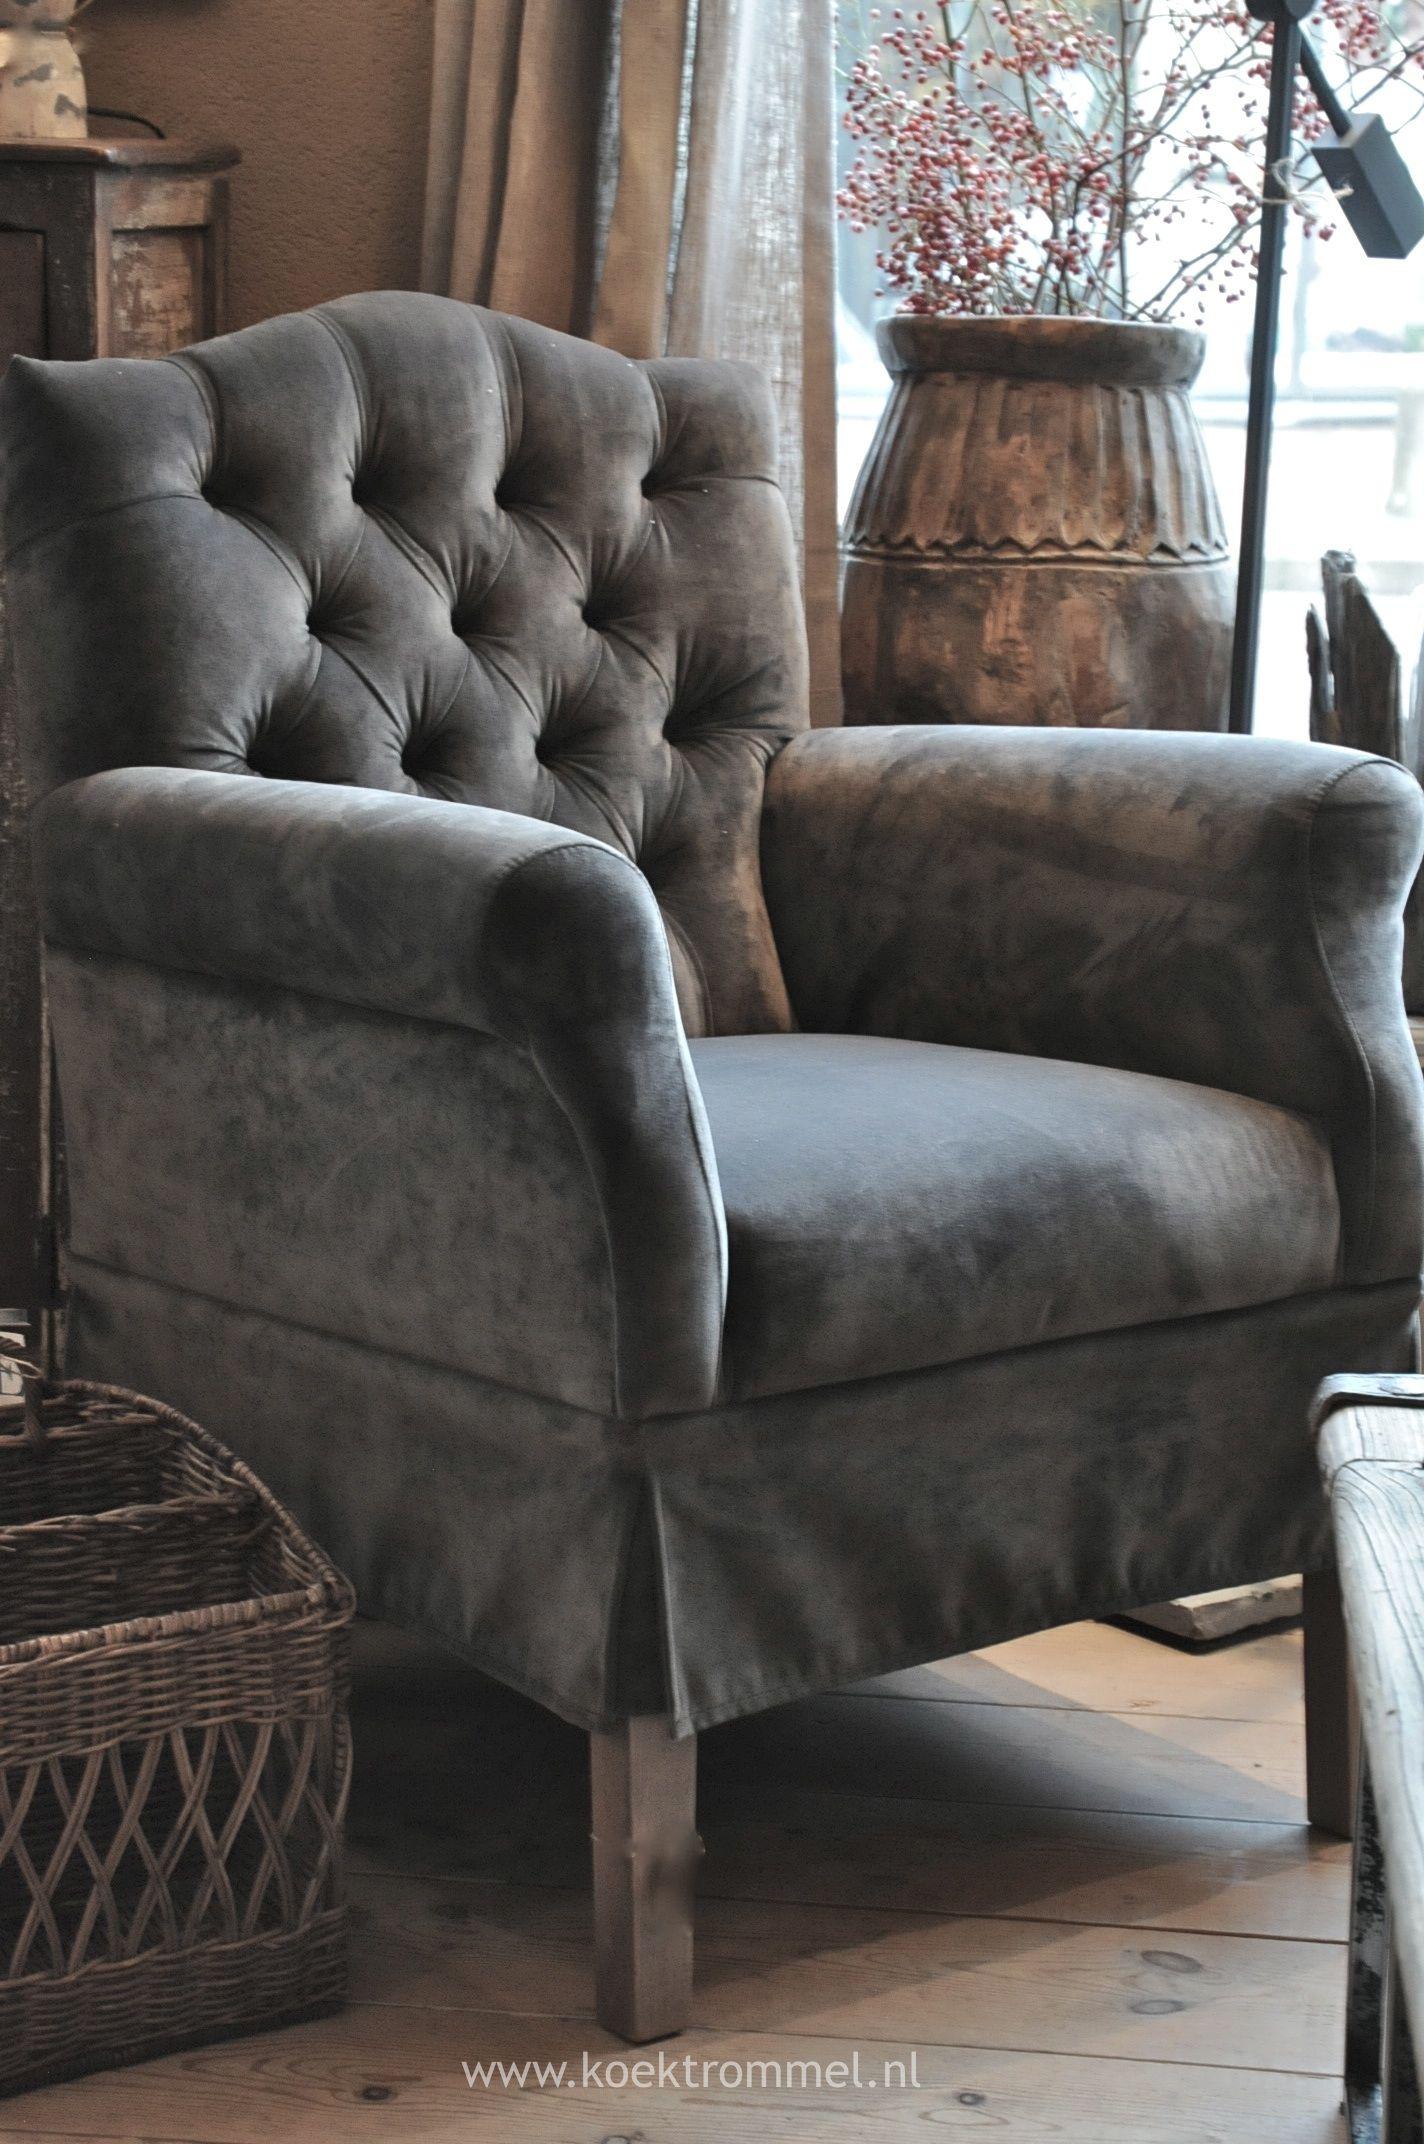 Hoffz interieurs zitmeubelen, sofa, fauteuil, stoel | 't